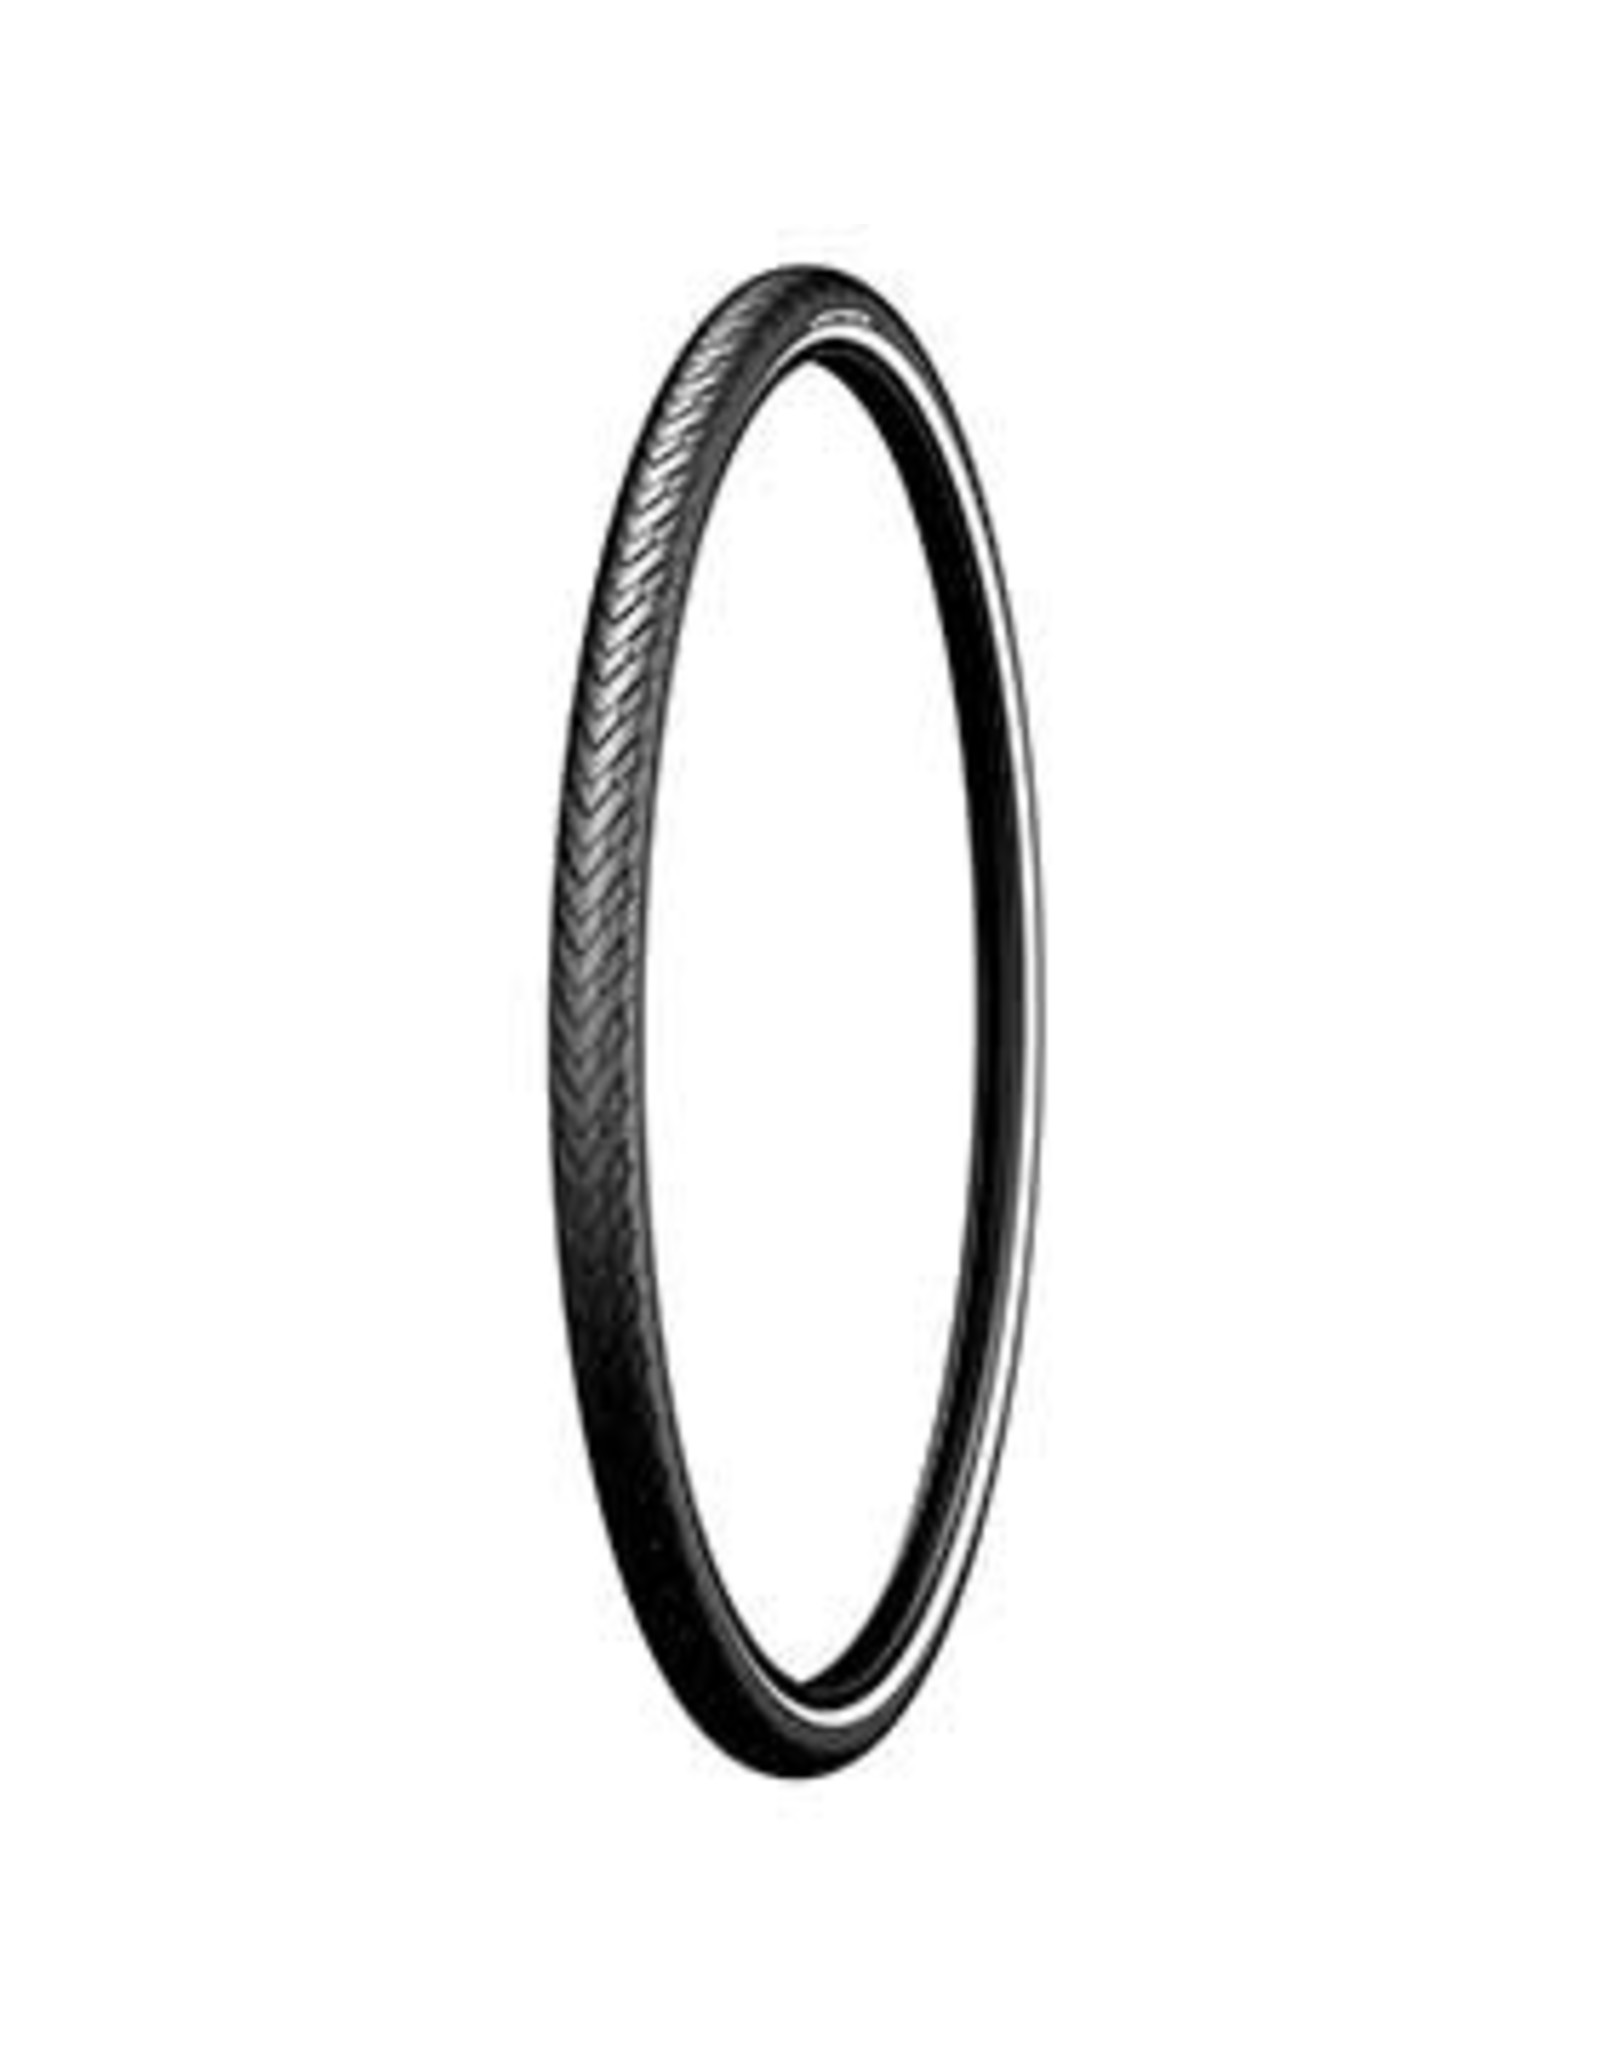 Michelin Protek, 26x1.85, Rigide